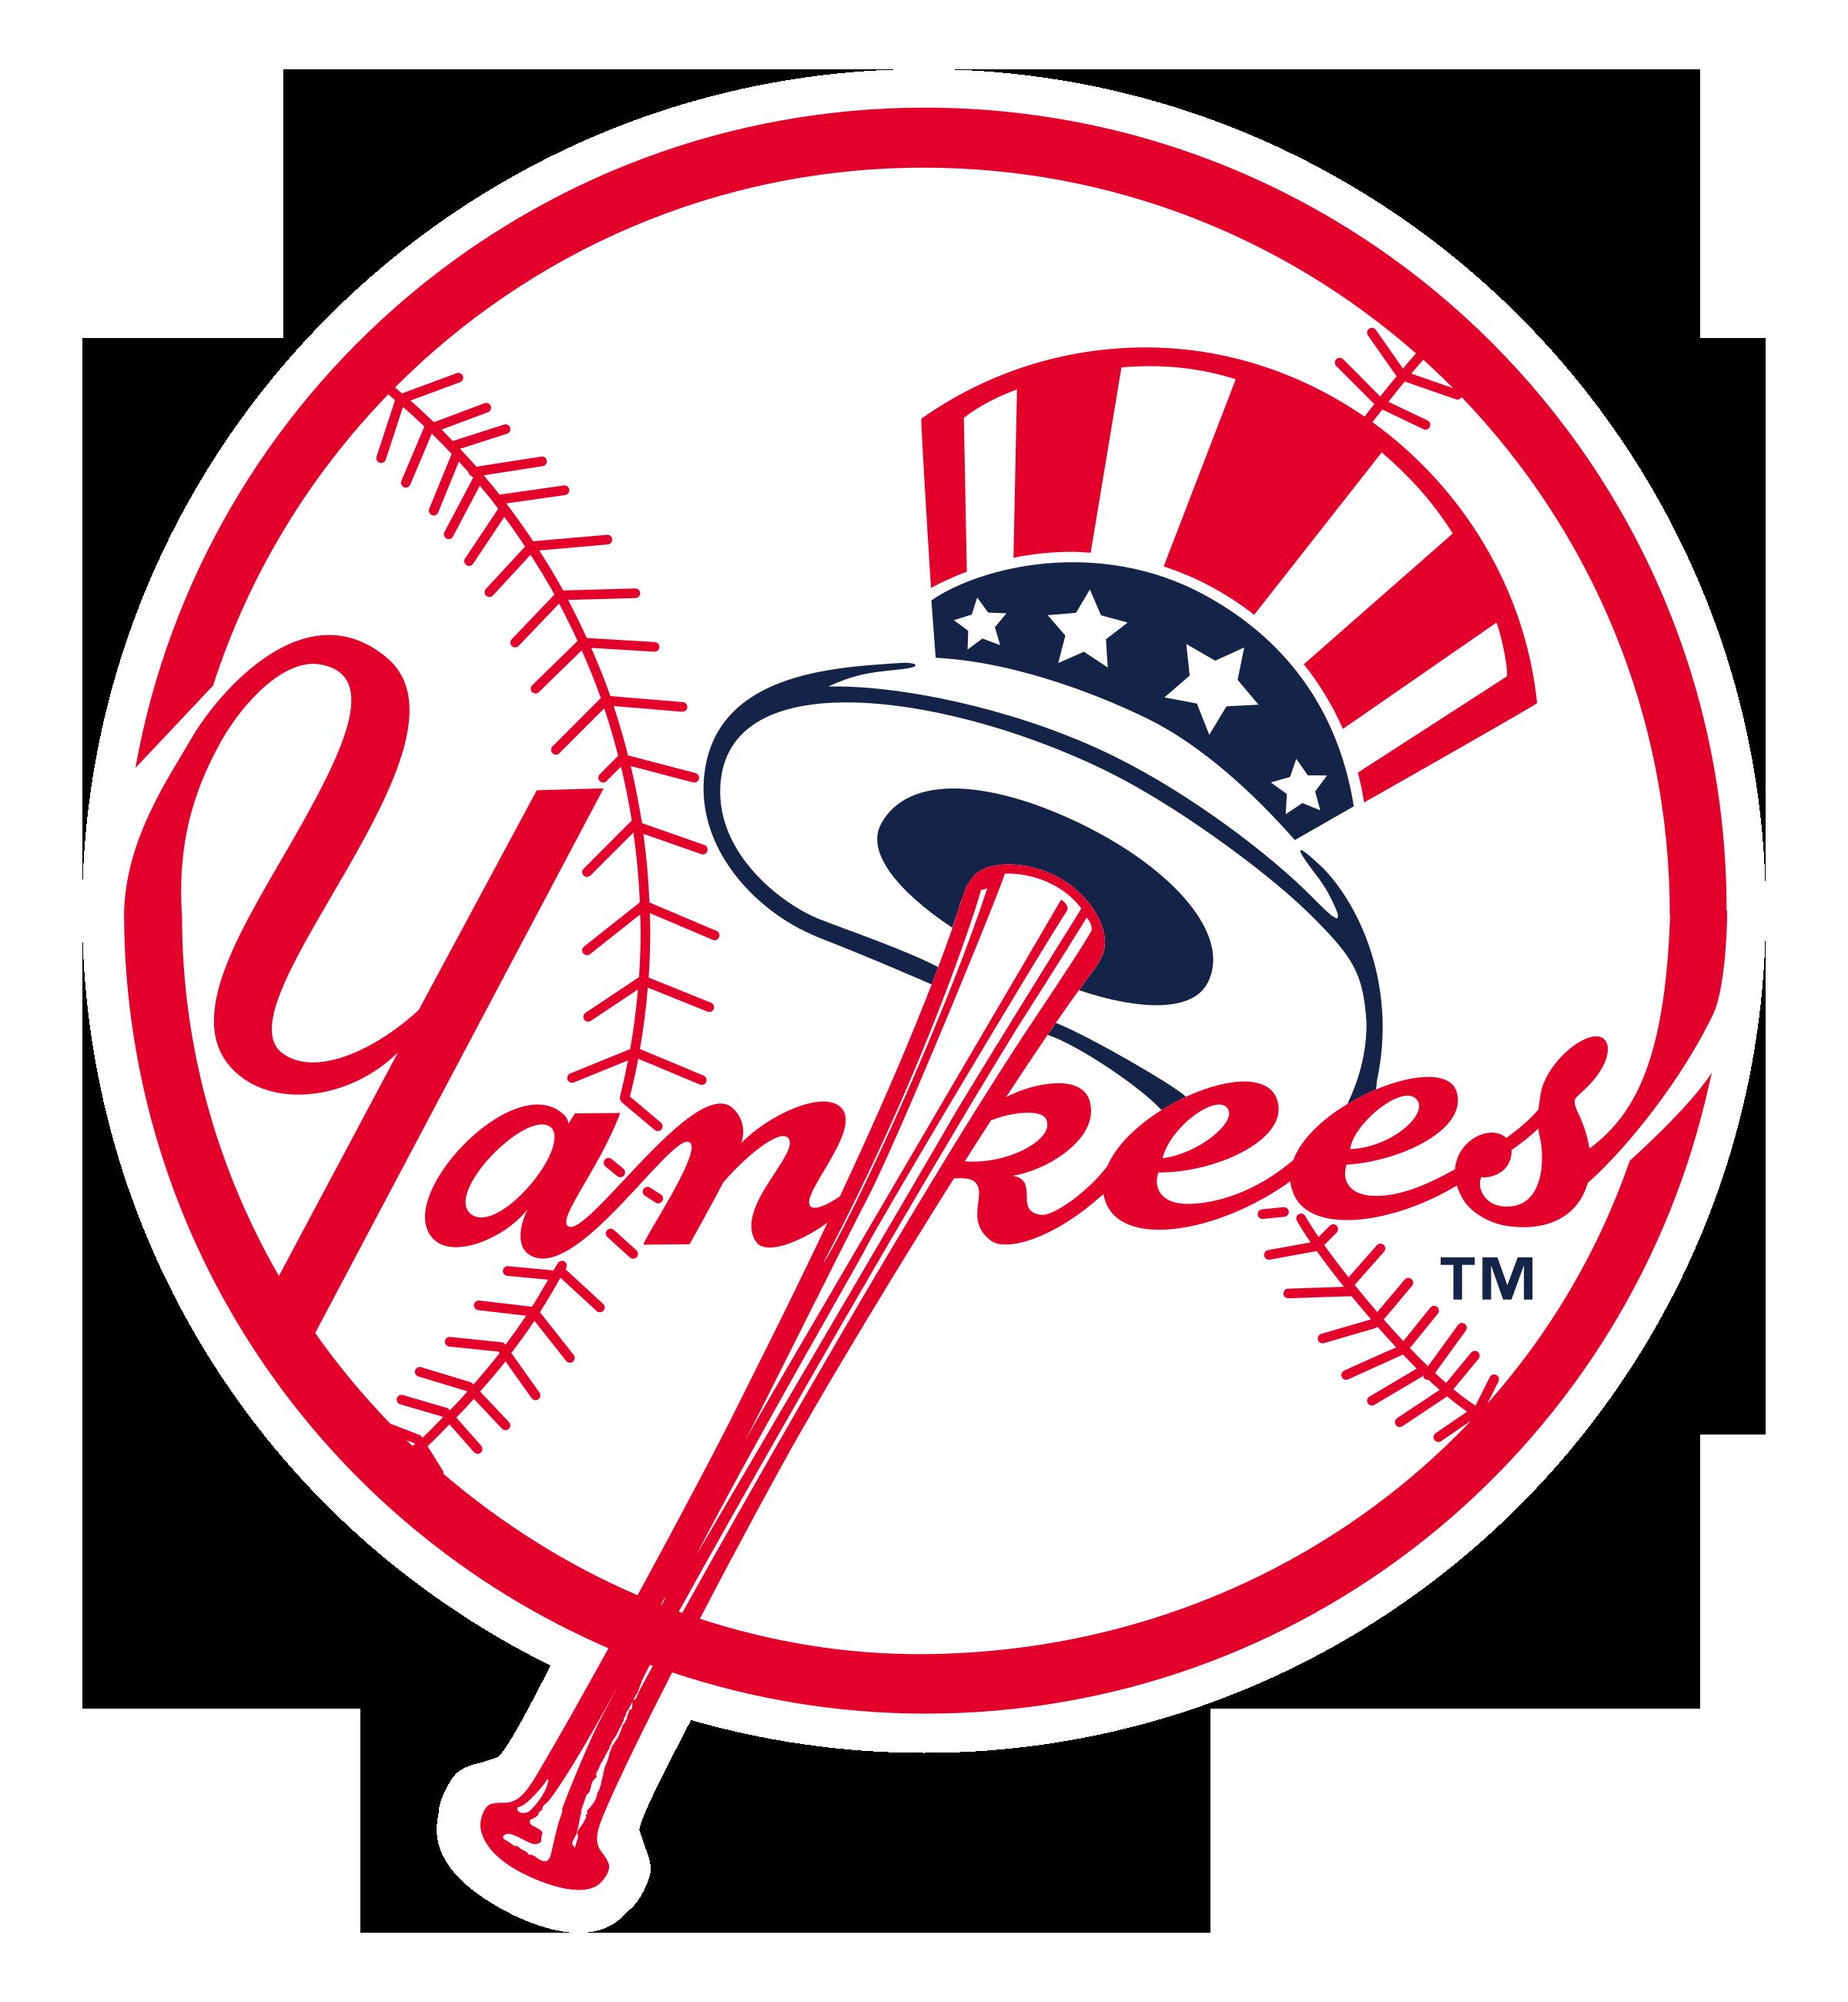 Yankee baseball clipart jpg free download New York Yankees Logo PNG Transparent & SVG Vector - Freebie Supply jpg free download